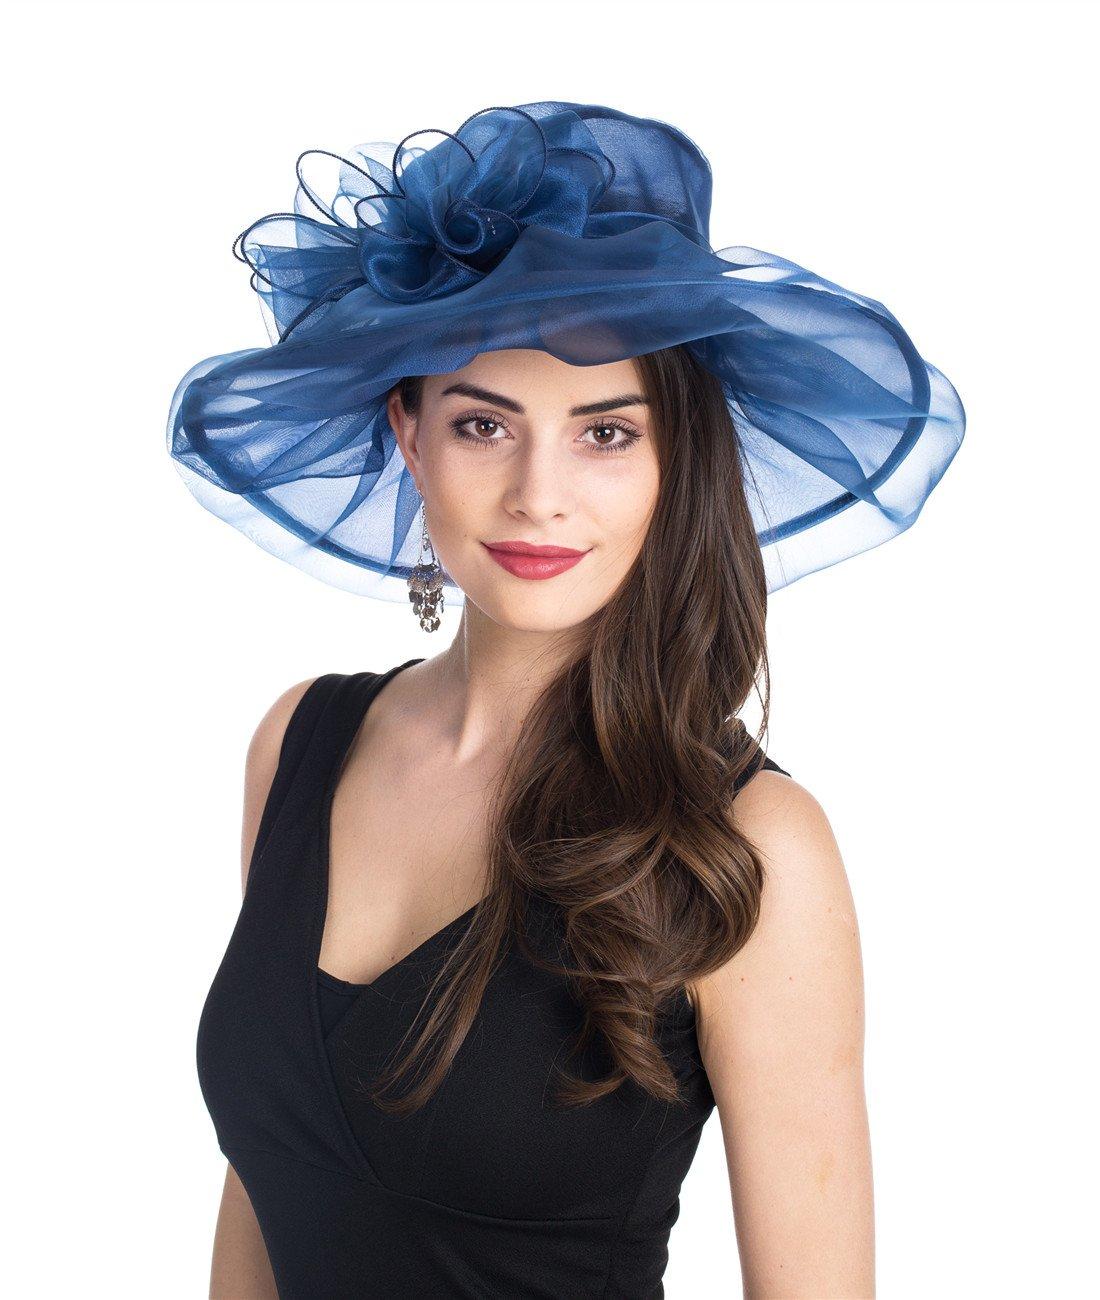 SAFERIN Women's Organza Church Kentucky Derby Fascinator Bridal Tea Party Wedding Hat (Navy with Bowknot)